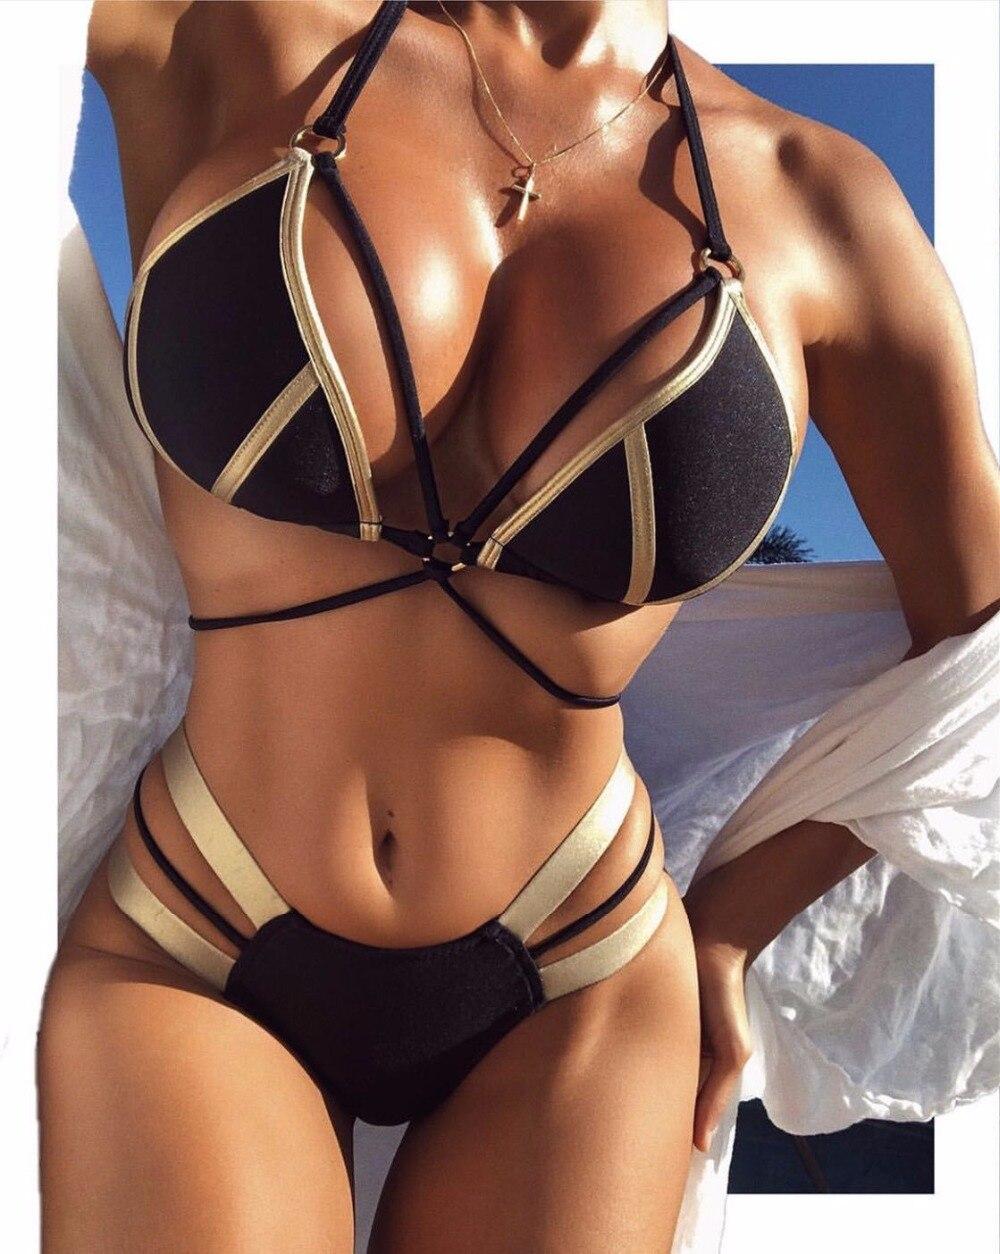 2018 High Quality Sex Bikinis Women Low Waist Brazilian Padded Bikinis Set Swimwear Women Beach Wear Swimsuits lack-up bikini weixia 2018 new arrival women 17276 swimwear bikini sets padded lacework 2 pieces swimsuits